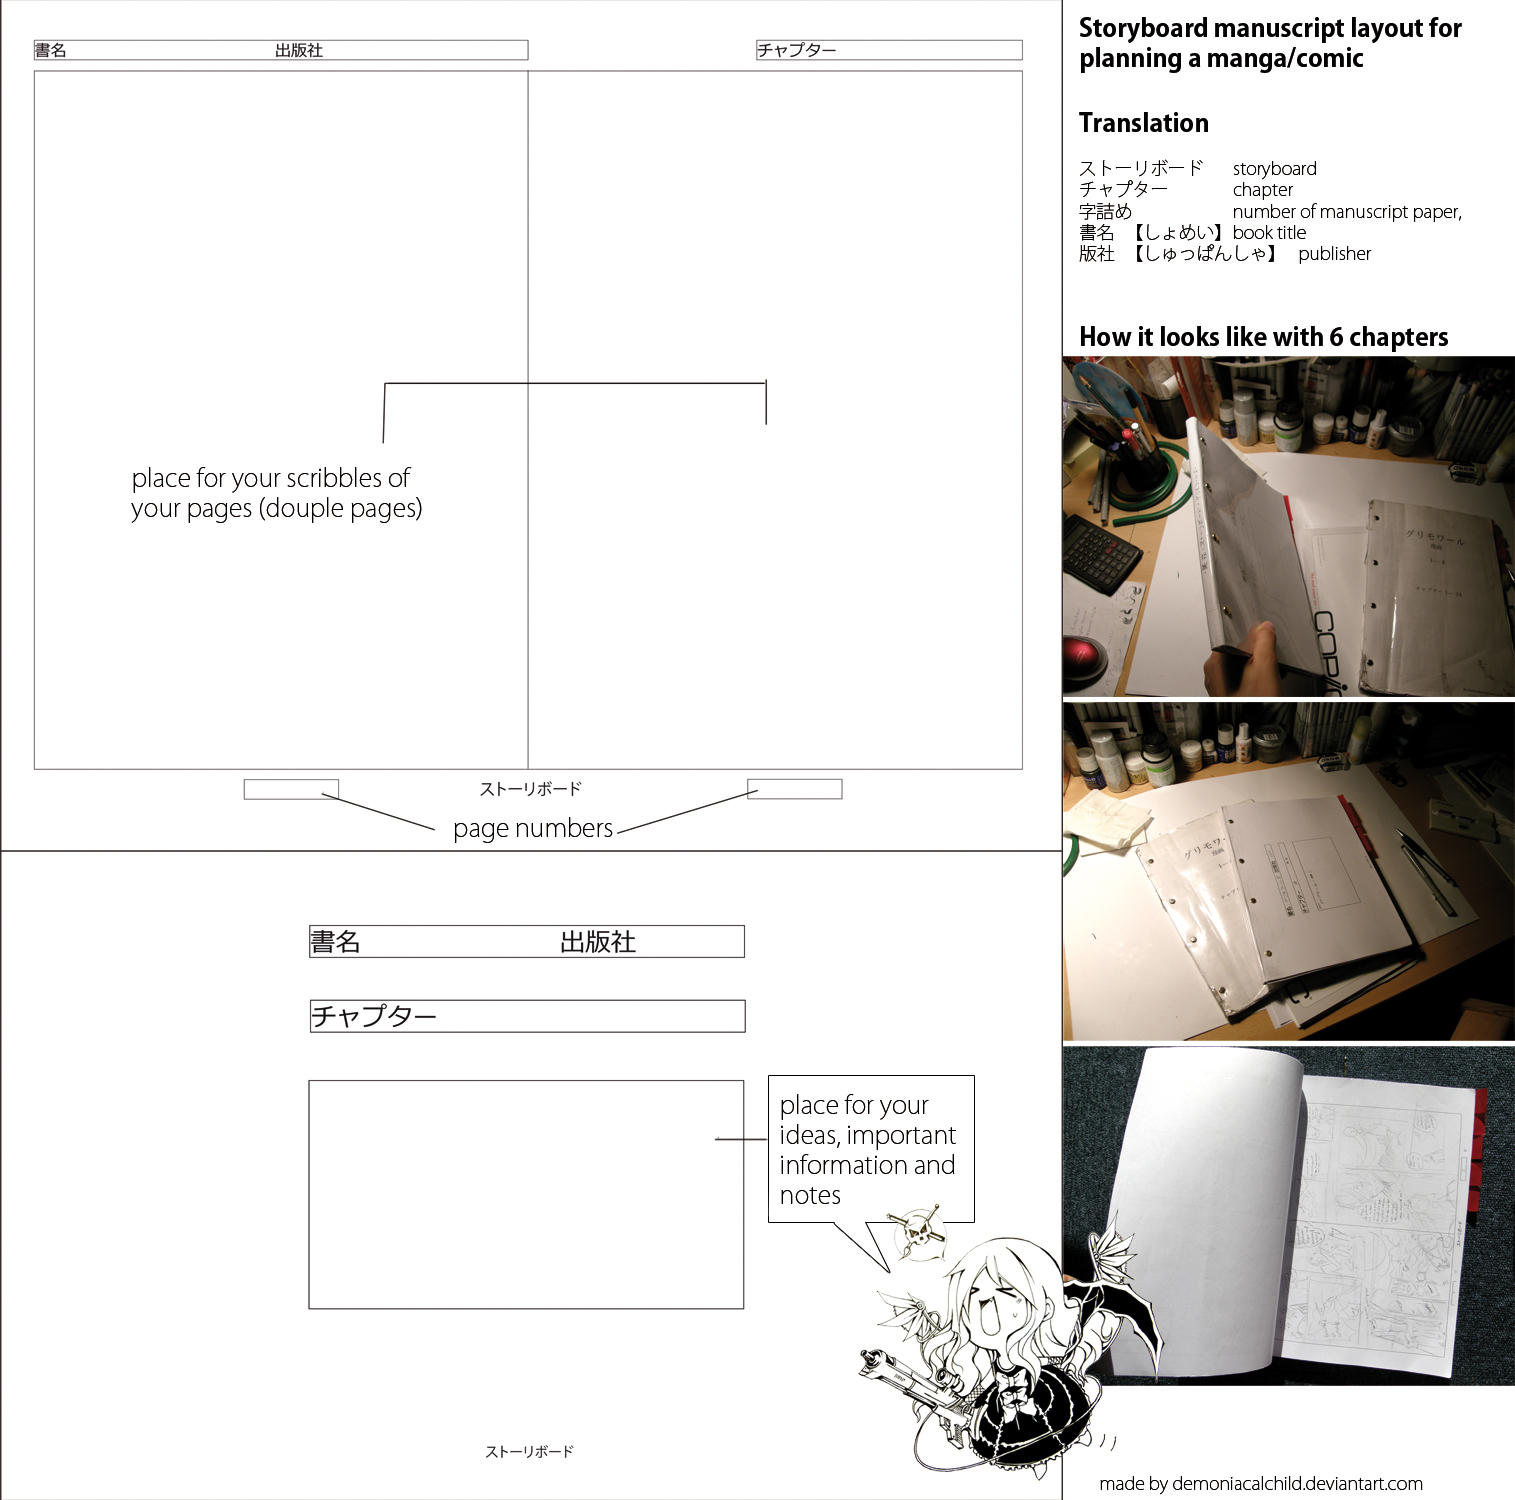 Storyboard template_download by demoniacalchild